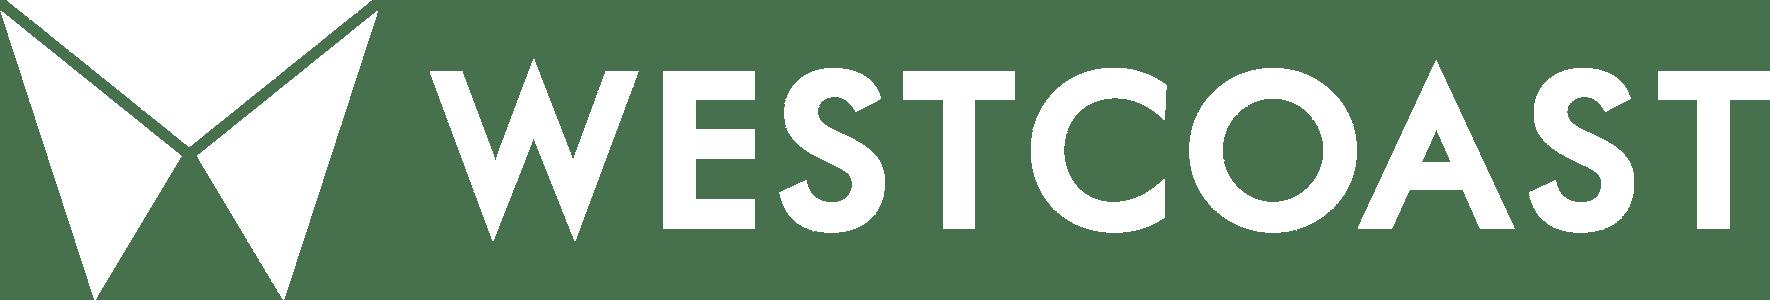 westcoastlogo-1